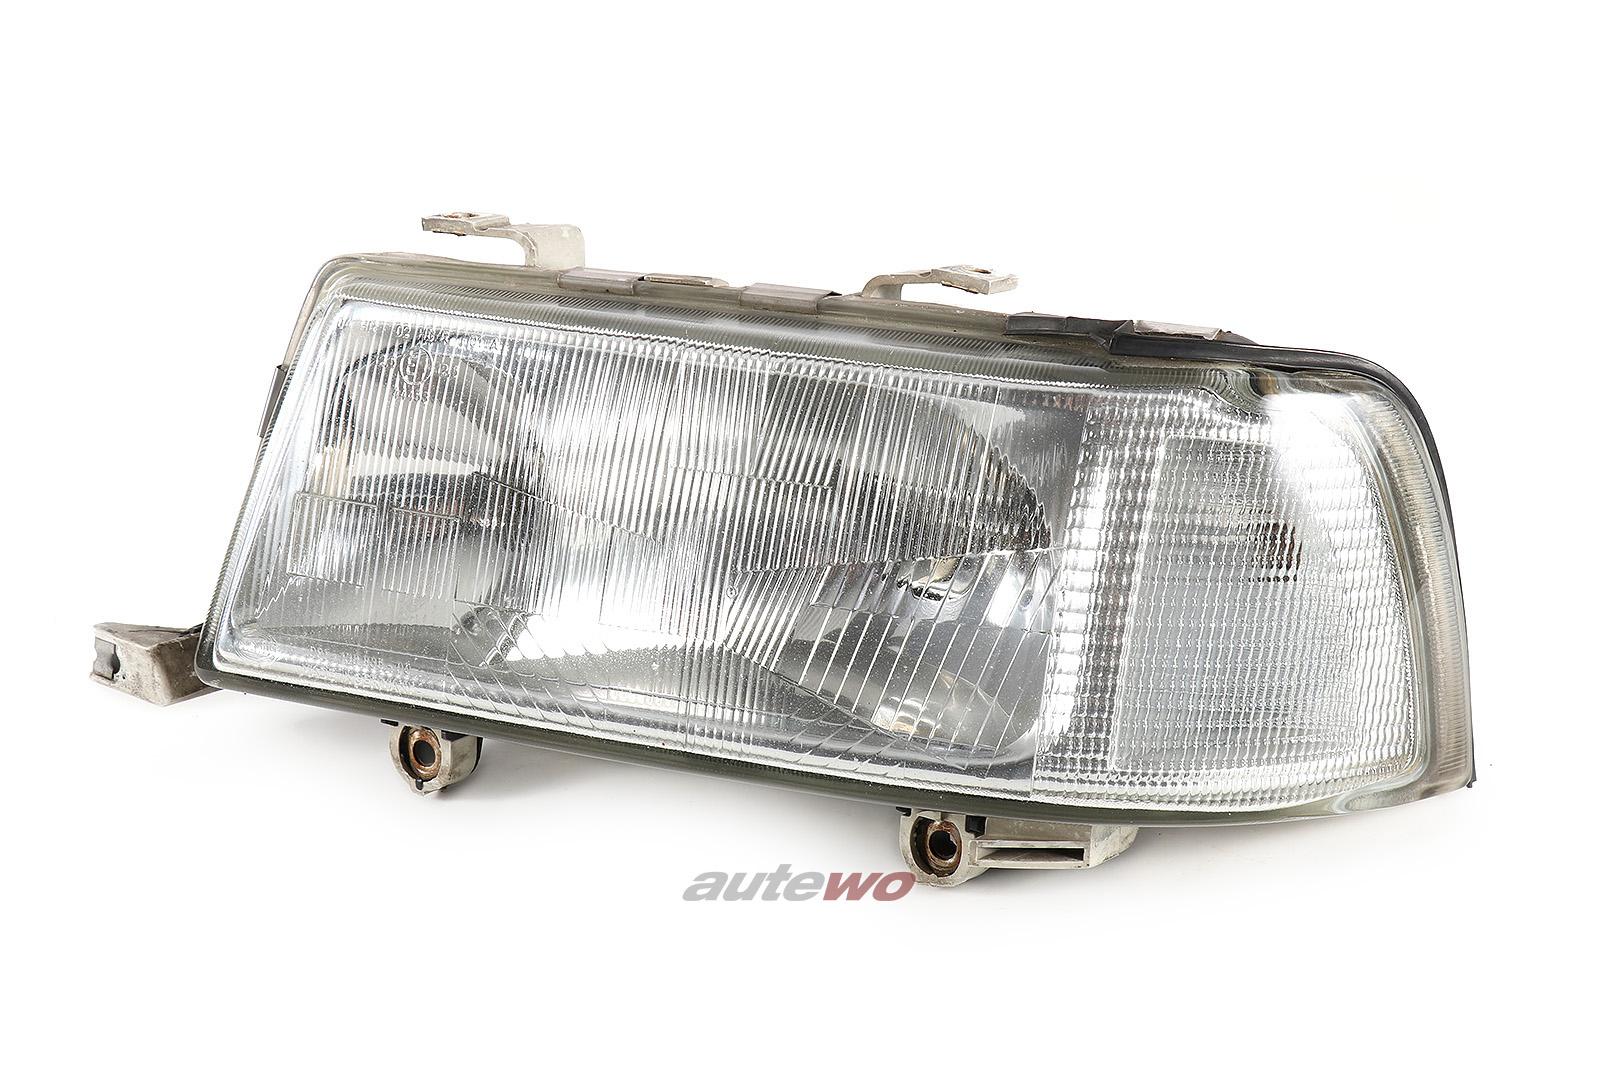 895941029F Hella 138837-00 Audi 80/Coupe/Cabrio Typ 89 Scheinwerfer Links